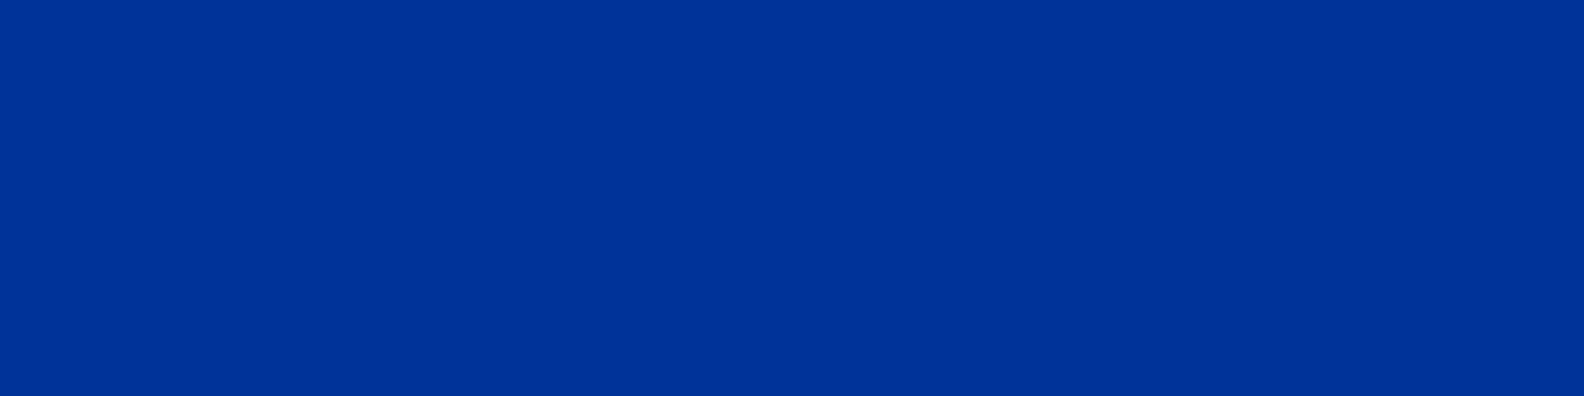 1584x396 Dark Powder Blue Solid Color Background